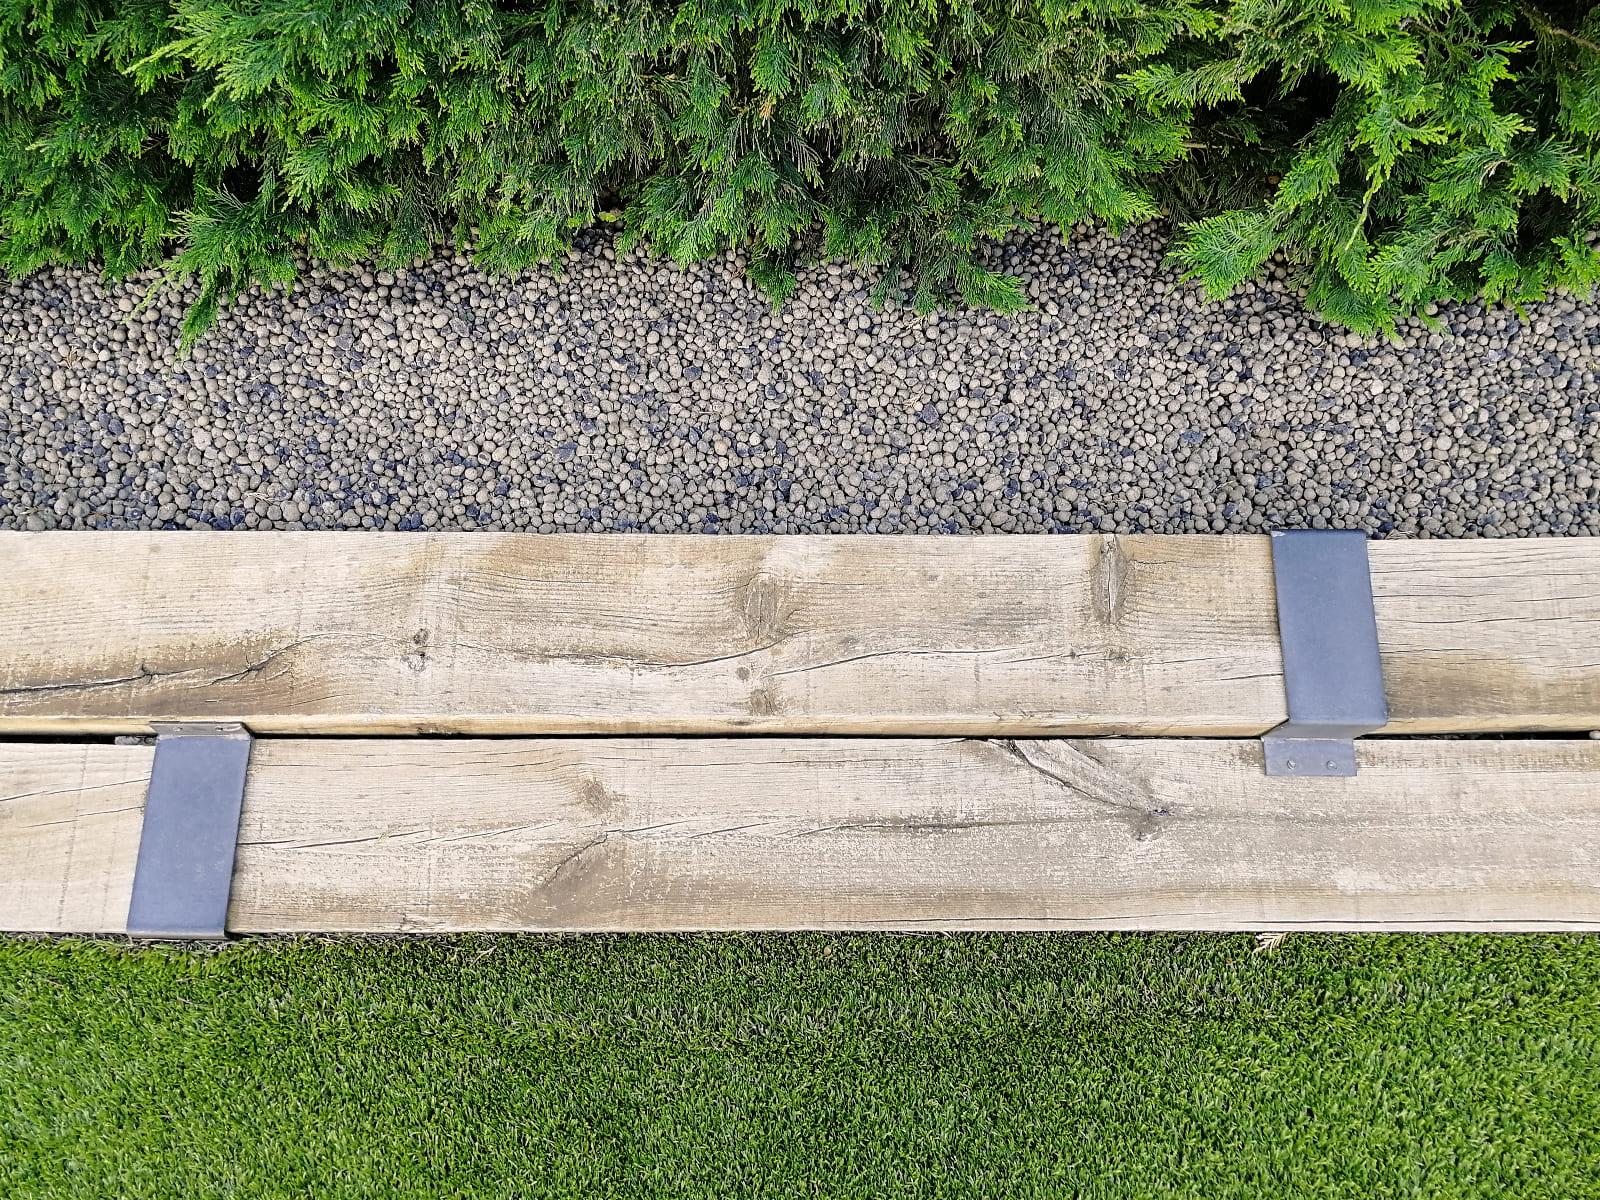 diseño-jardines-piscina-solarium-madera-IJ-07_HIDROJARDIN-Bañeres.jpg